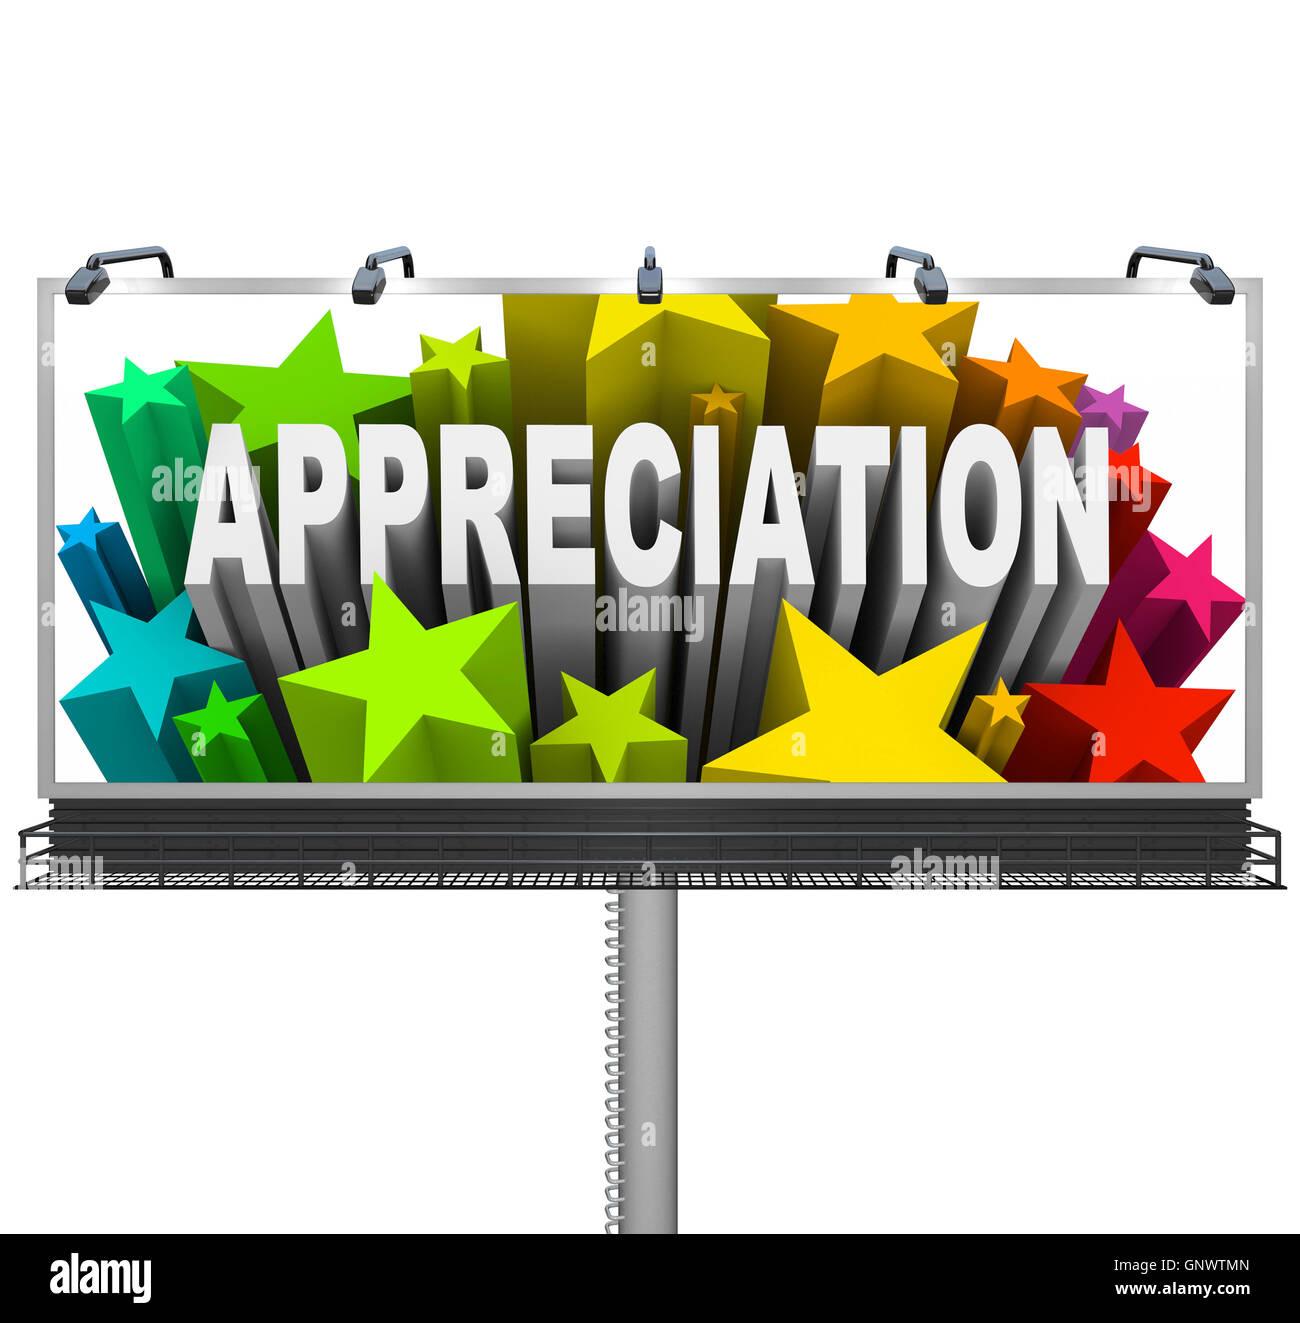 Appreciation Billboard Recognition of Good Work - Stock Image